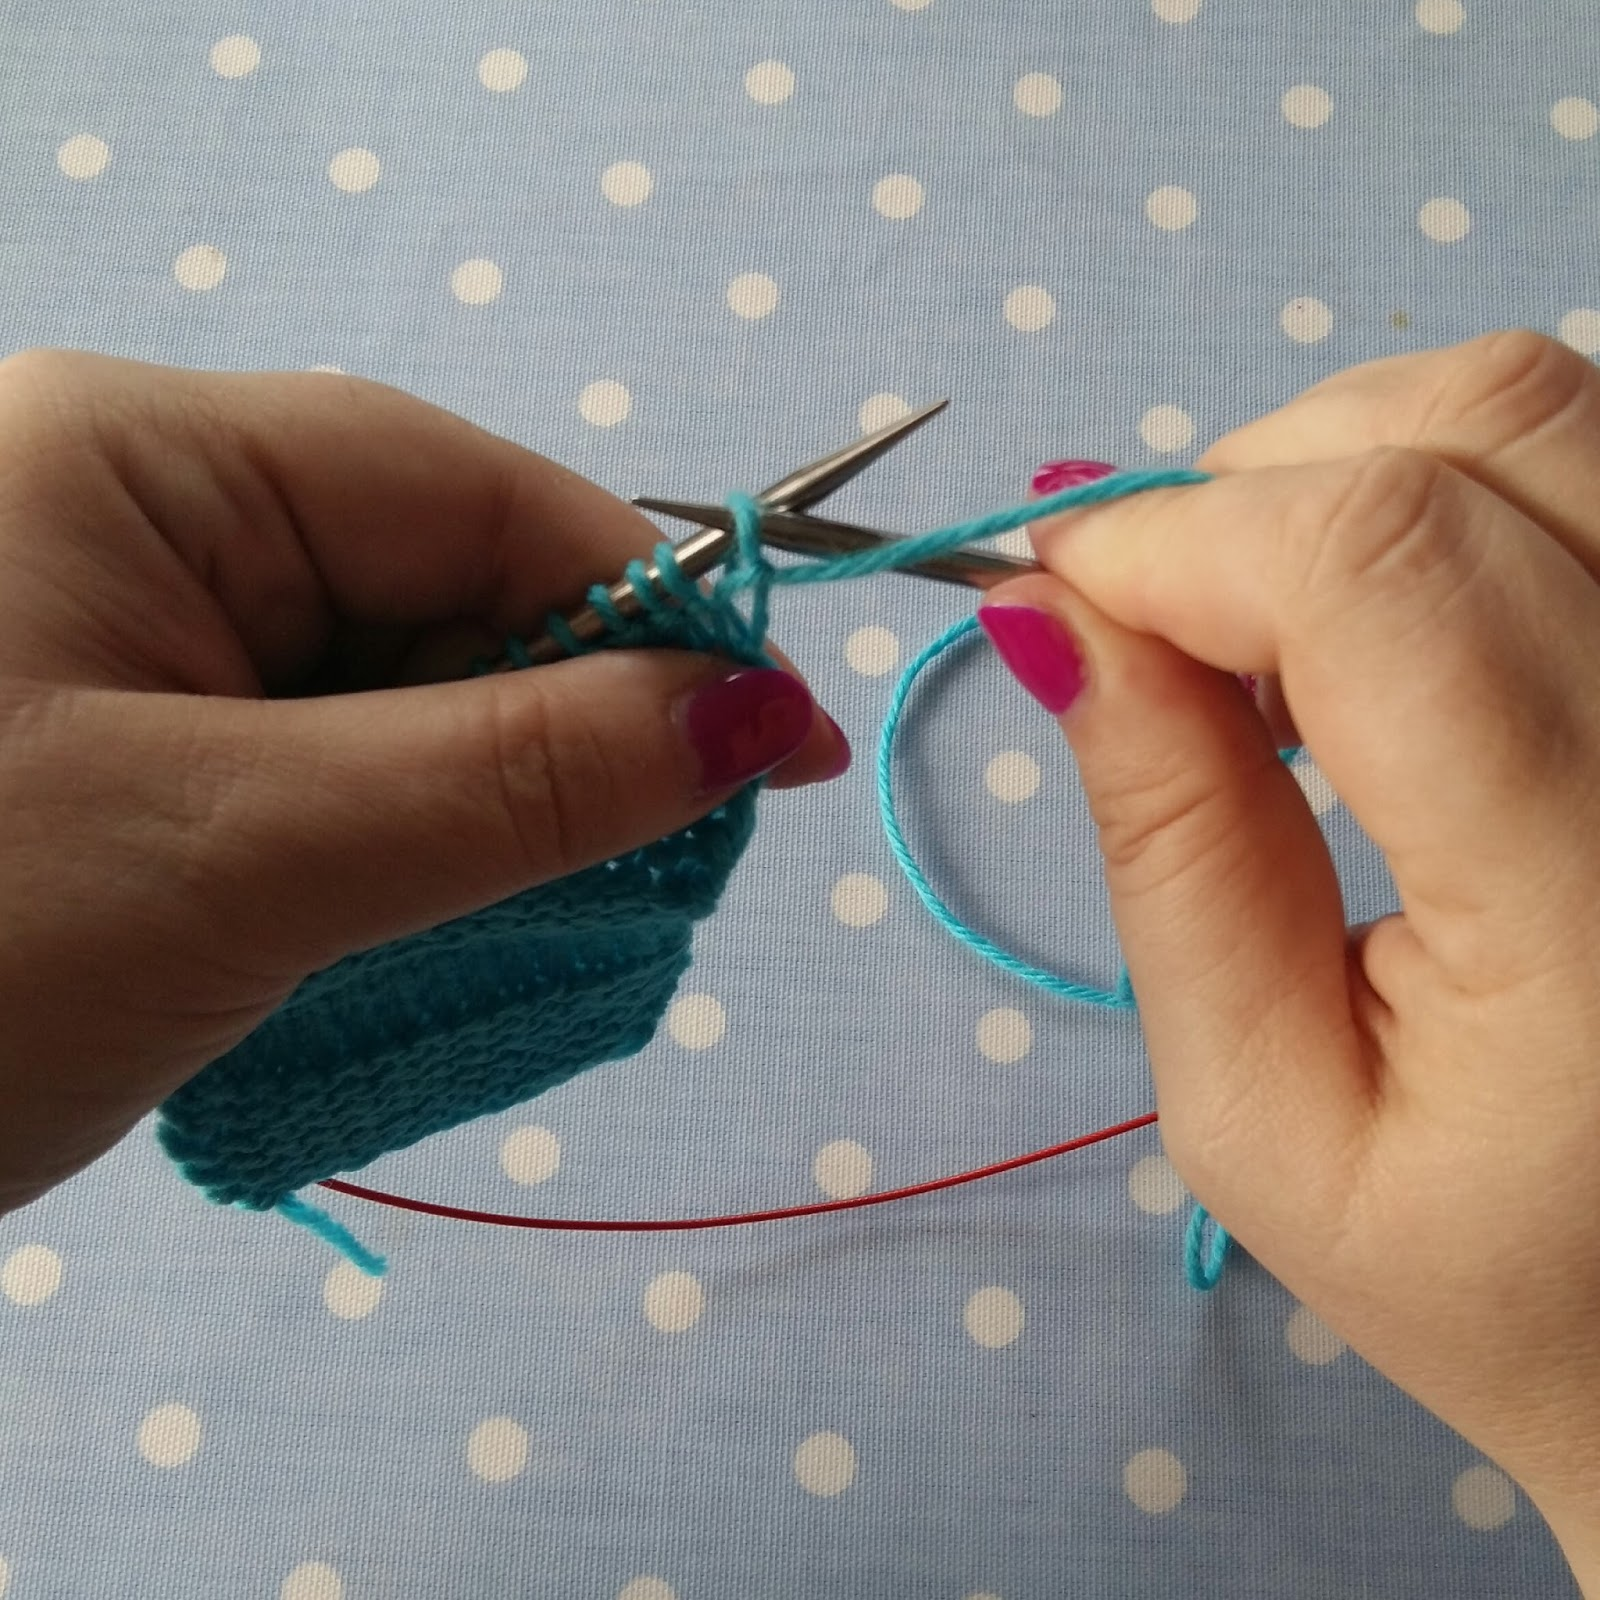 Knitting Stitches Slip Purlwise : Confessions of a YarnAddict: Mini Tip Monday - Slipping Stitches